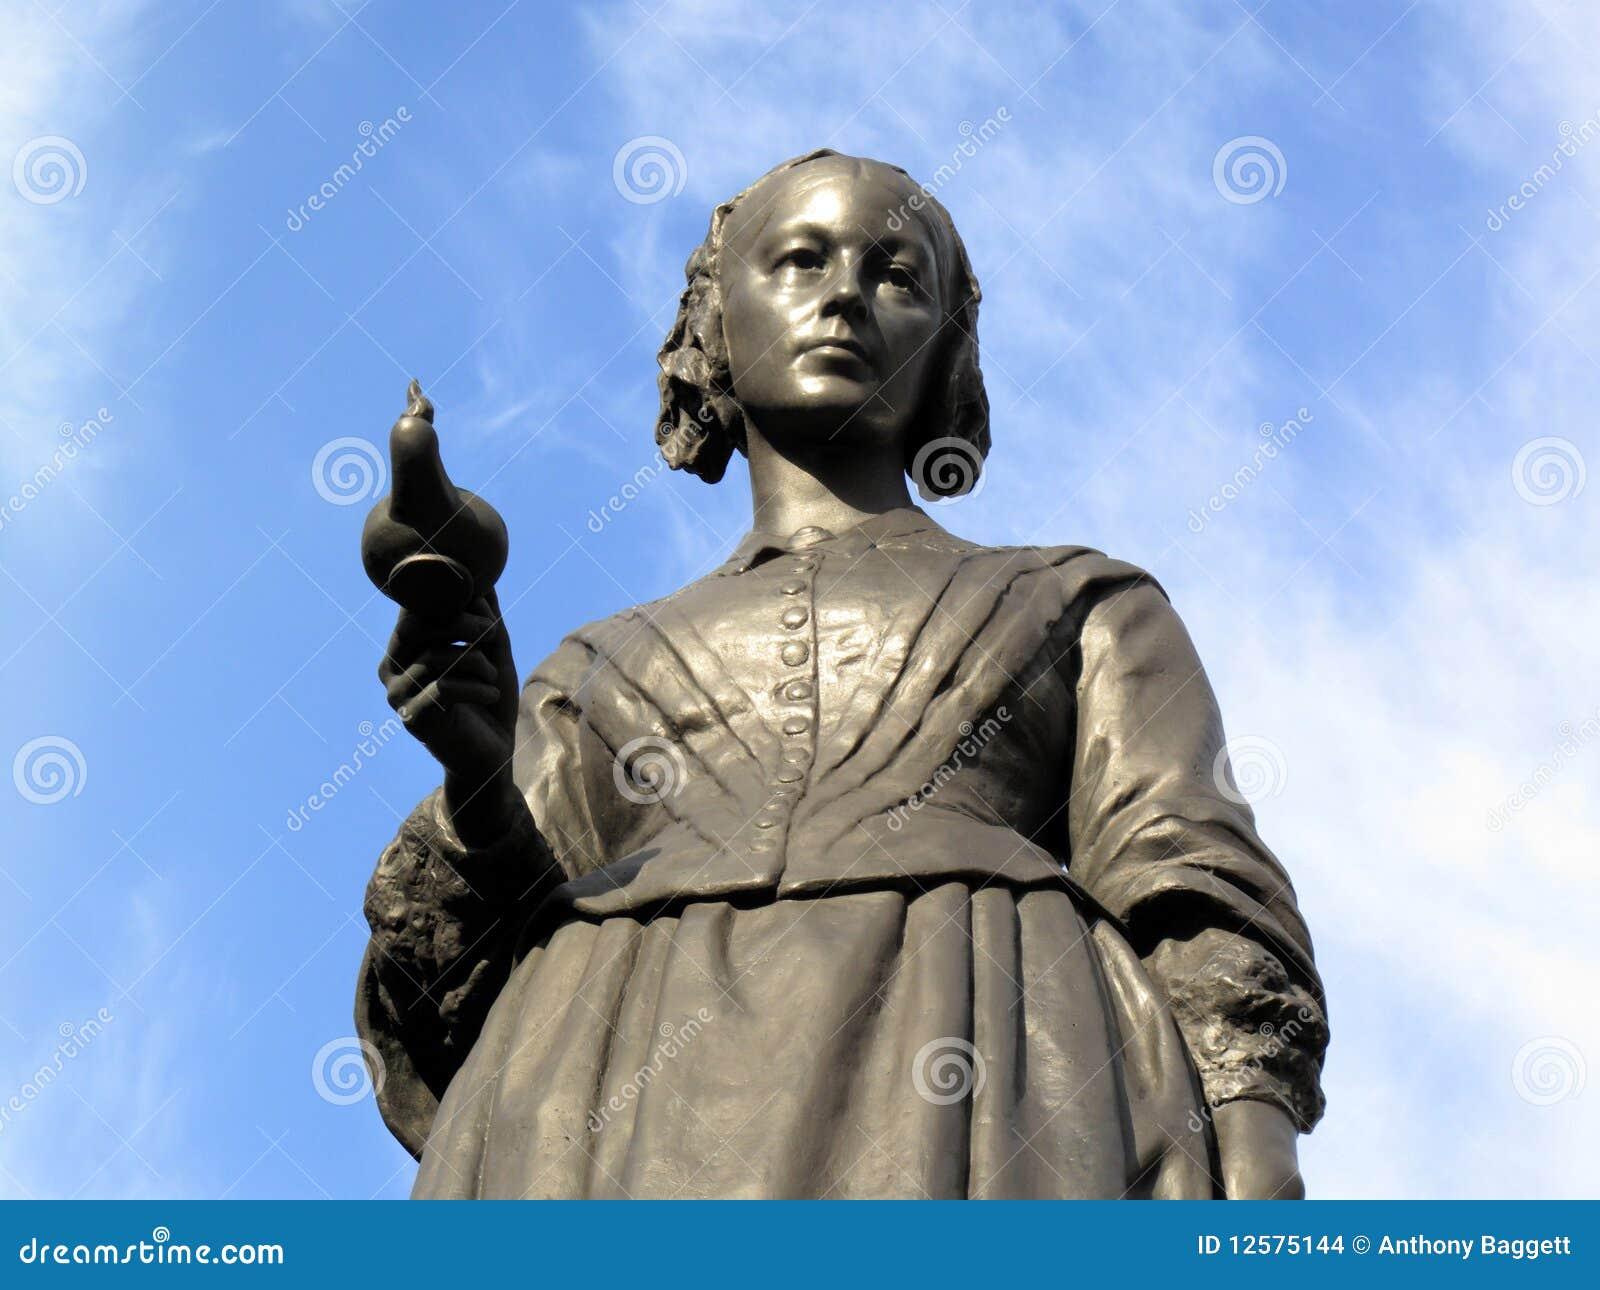 Florence Nightingale Statue Stock Images Image 12575144